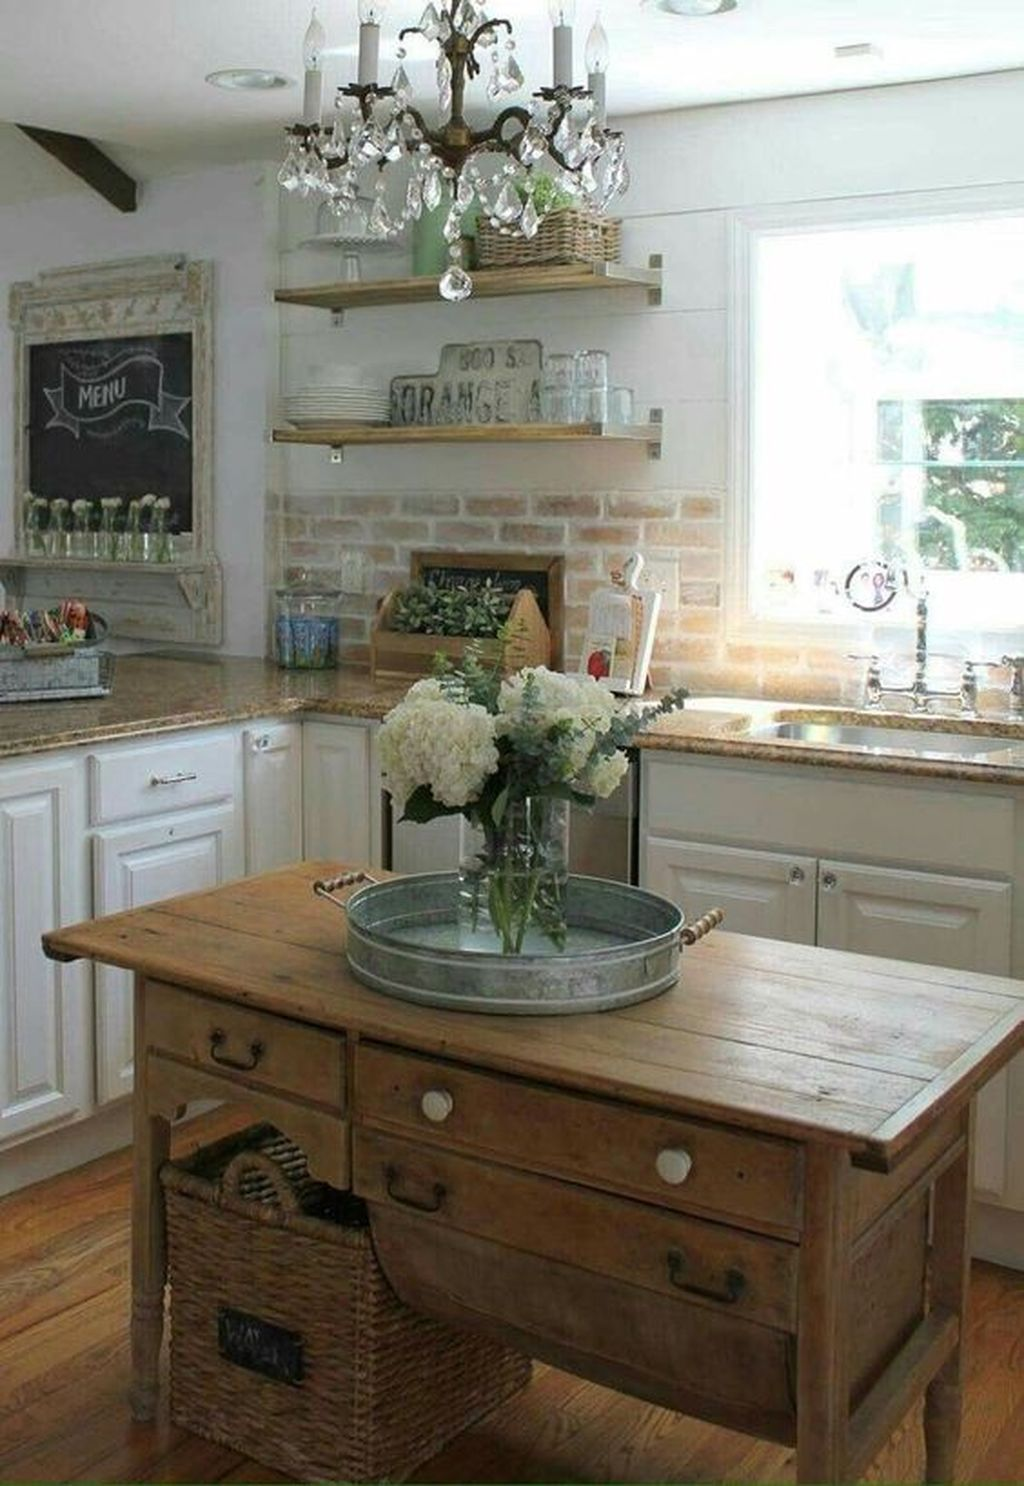 46 inspiring rustic country kitchen ideas to renew your ordinary kitchen rustic farmhouse on kitchen decor ideas farmhouse id=58693